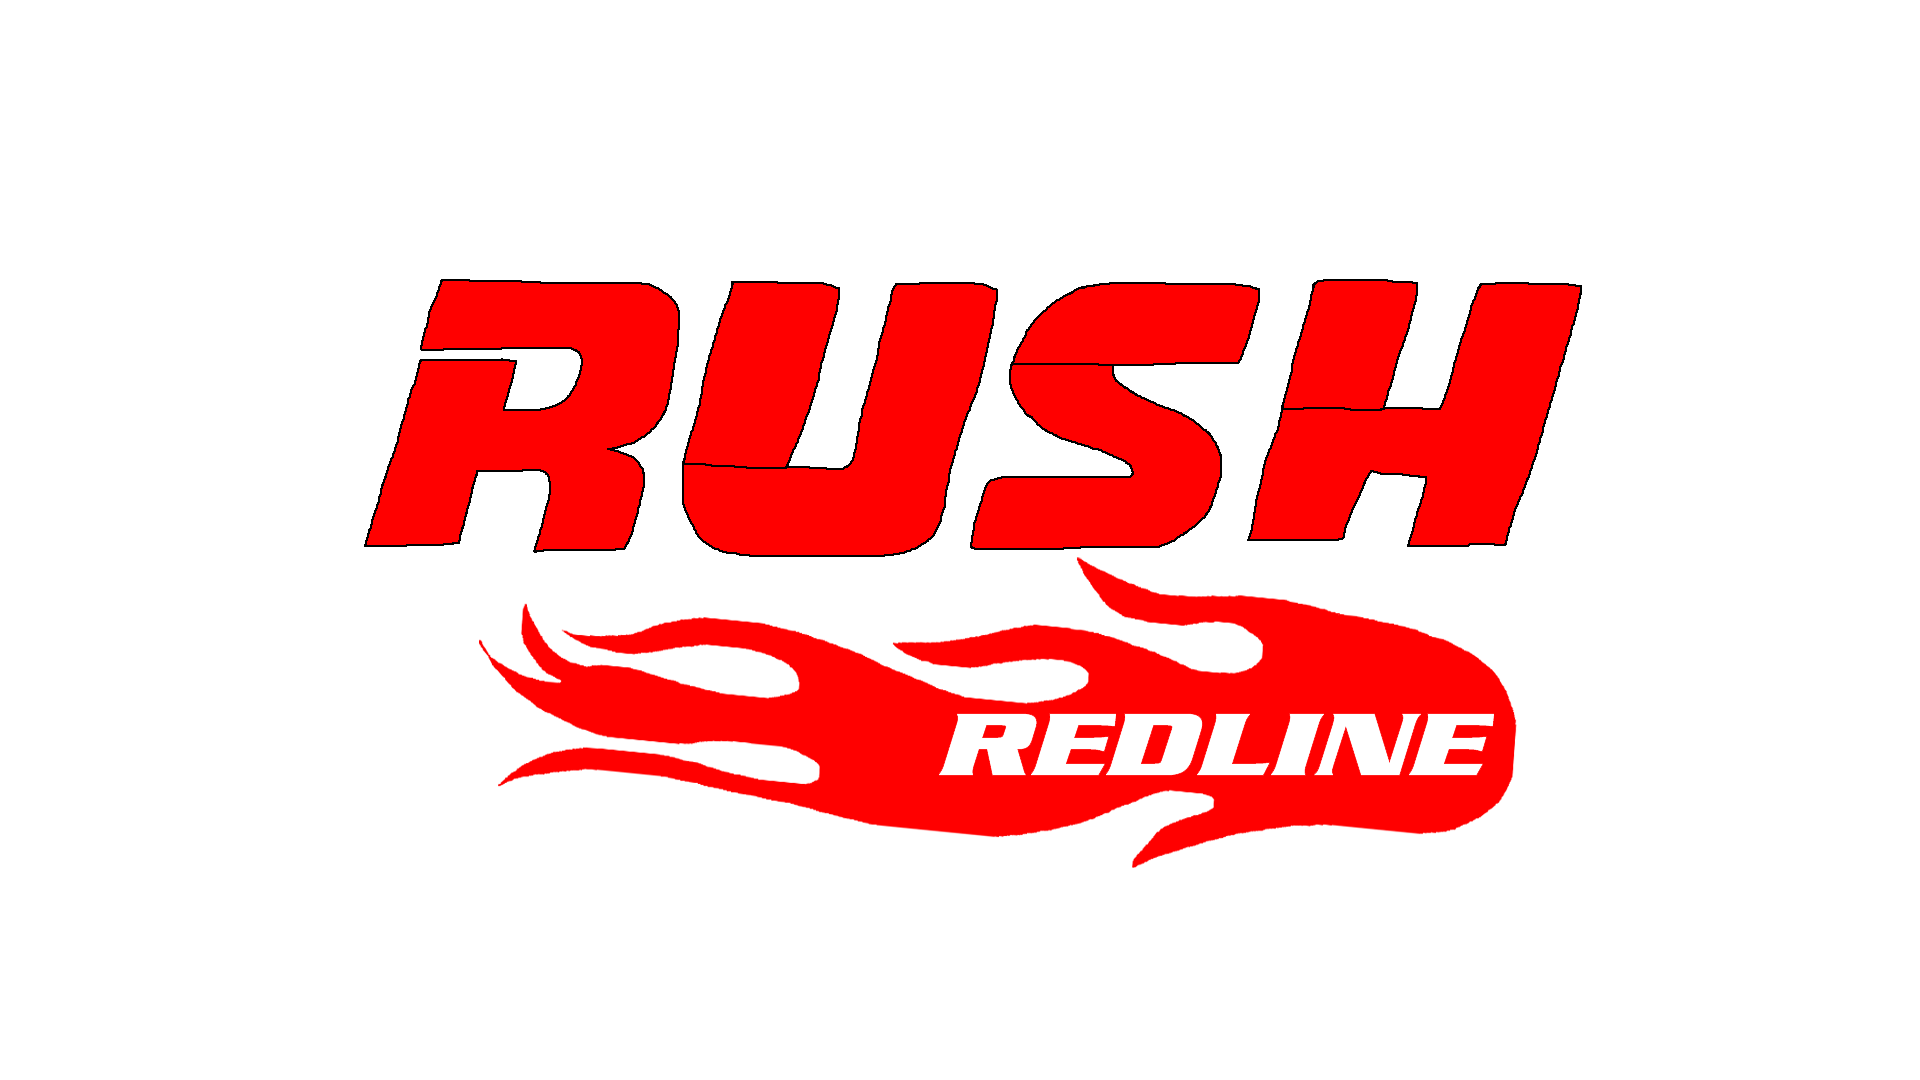 RUSH Redline by Rainbow-Dash-Rockz